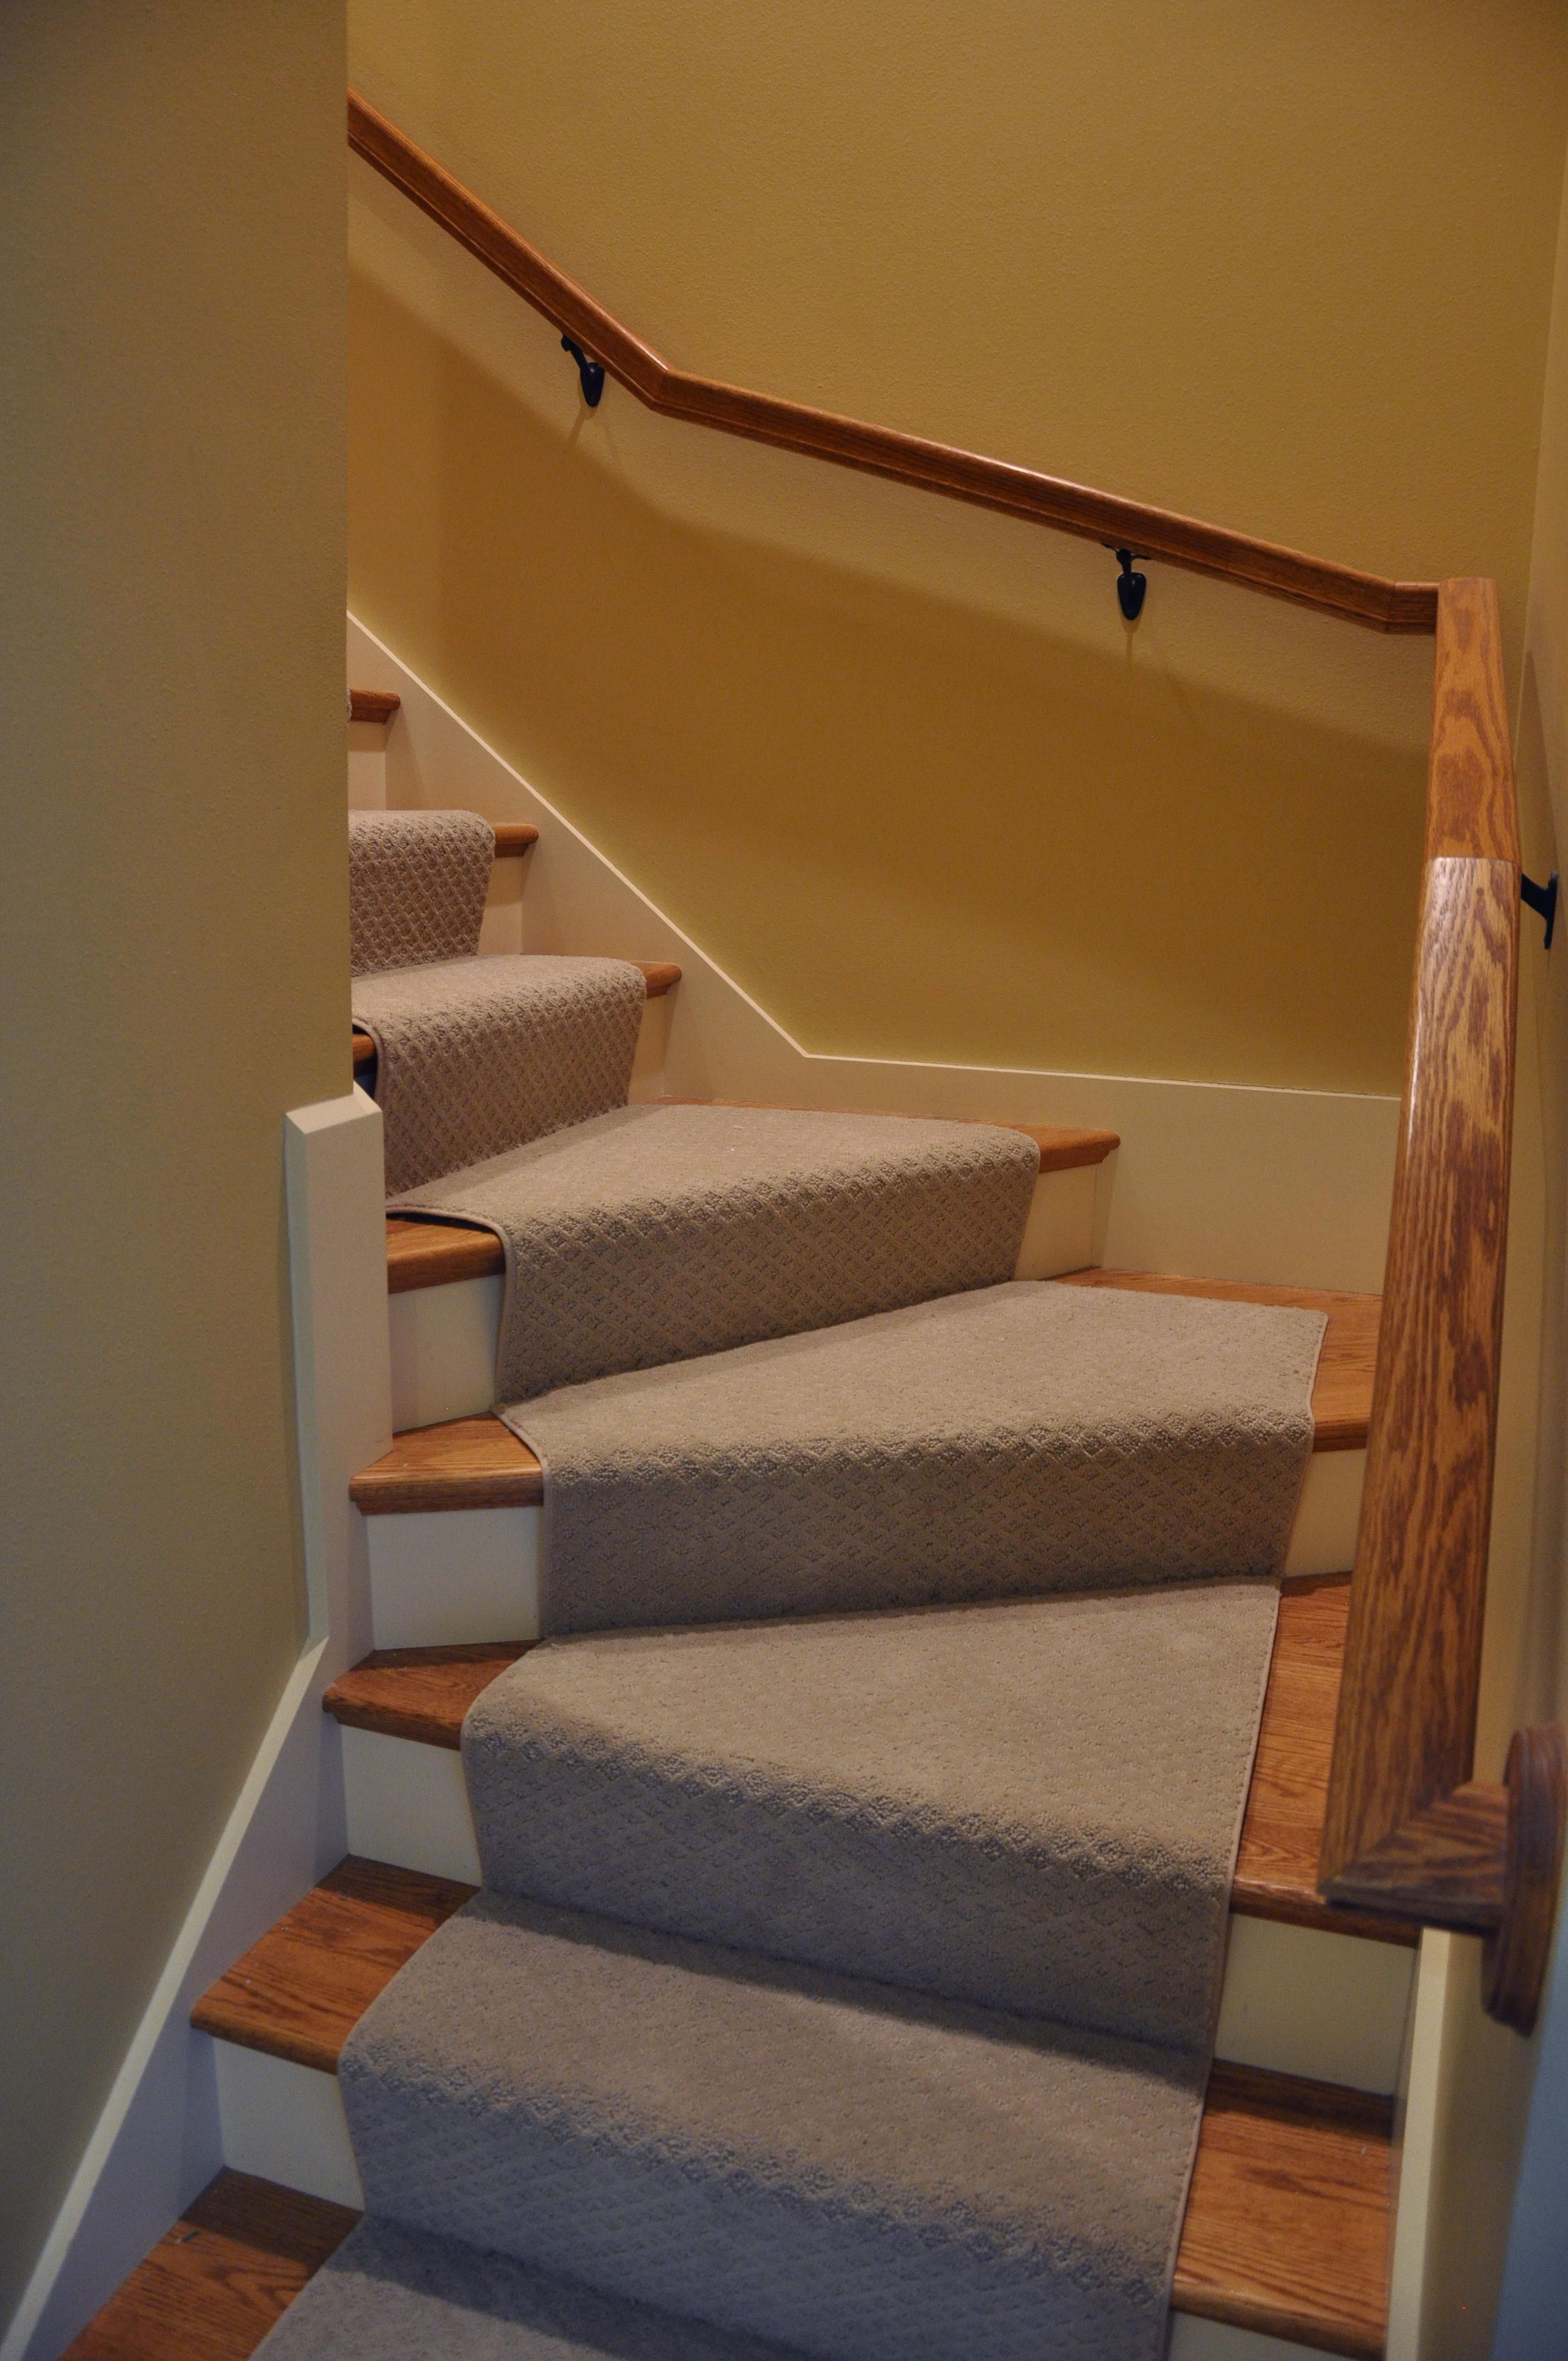 hardwood floor refinishing waukesha of hardwood stair treads staircasing installation milwaukee wi inside click image to enlarge